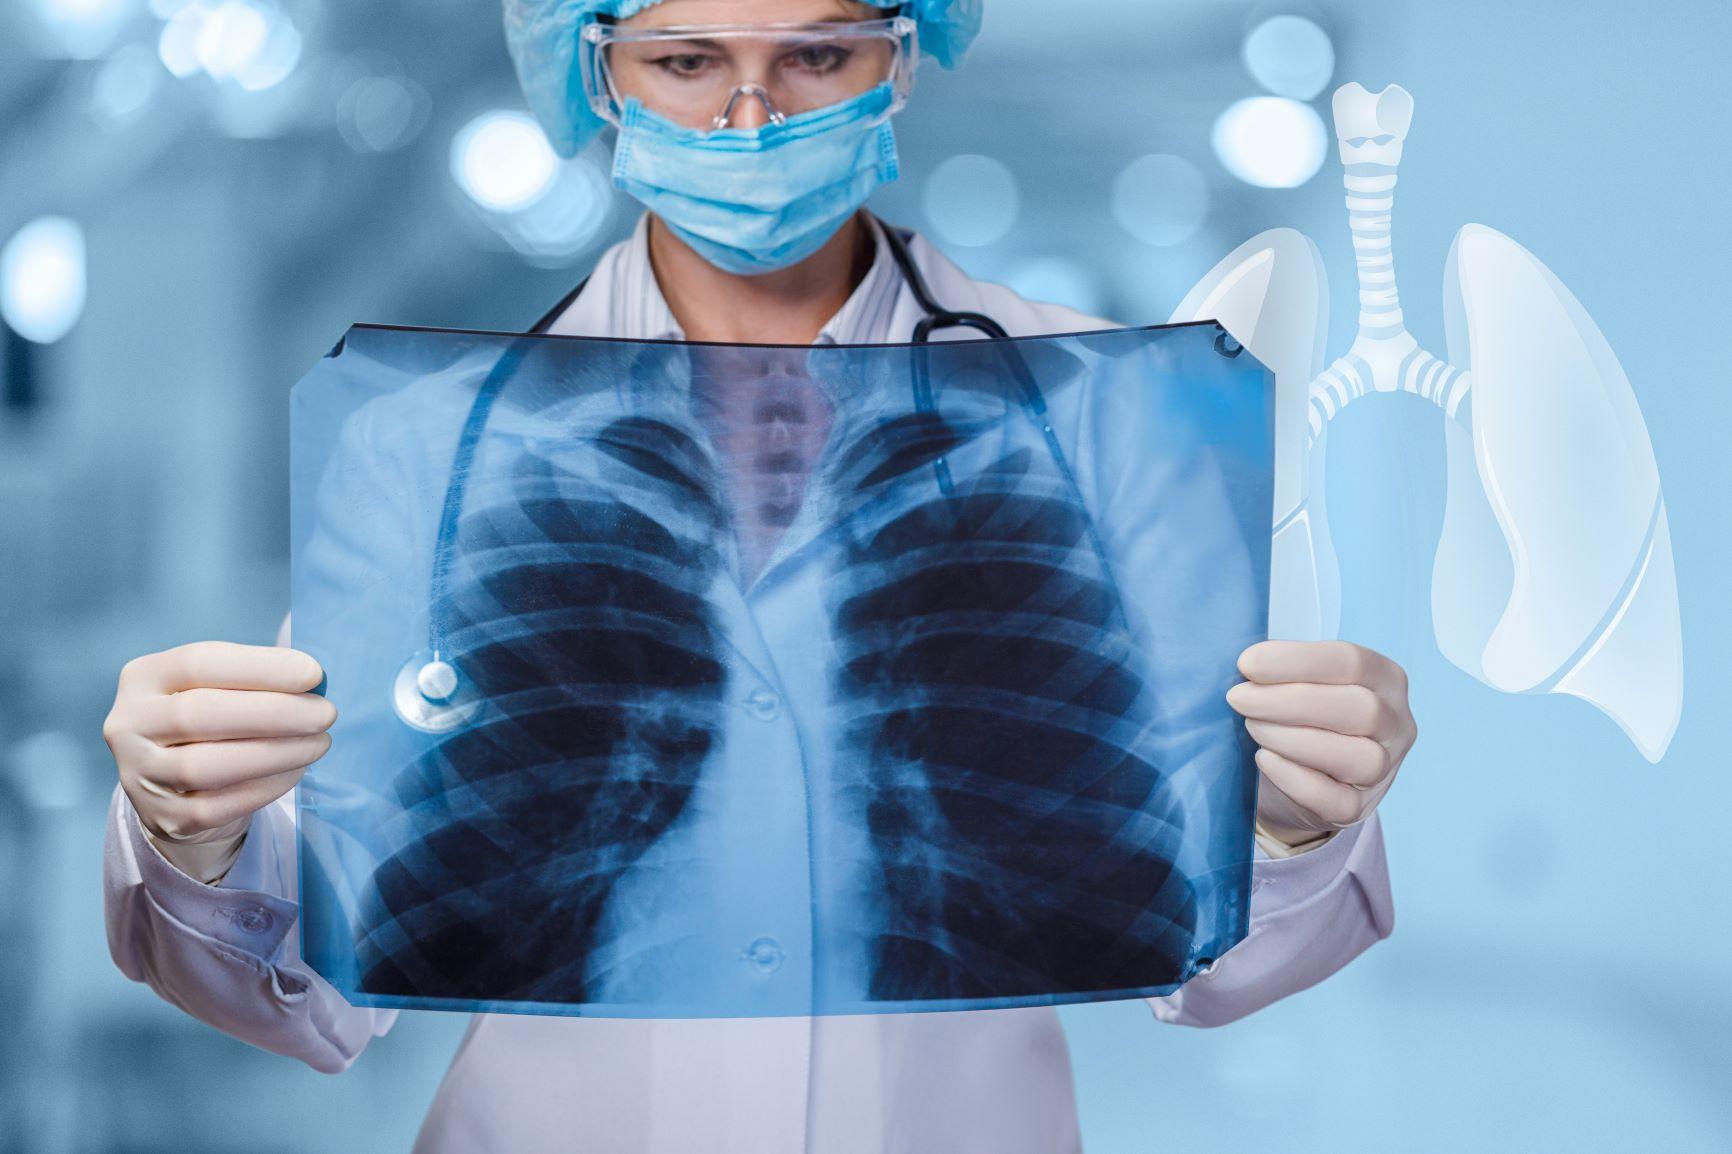 Lung damage, Covid-19